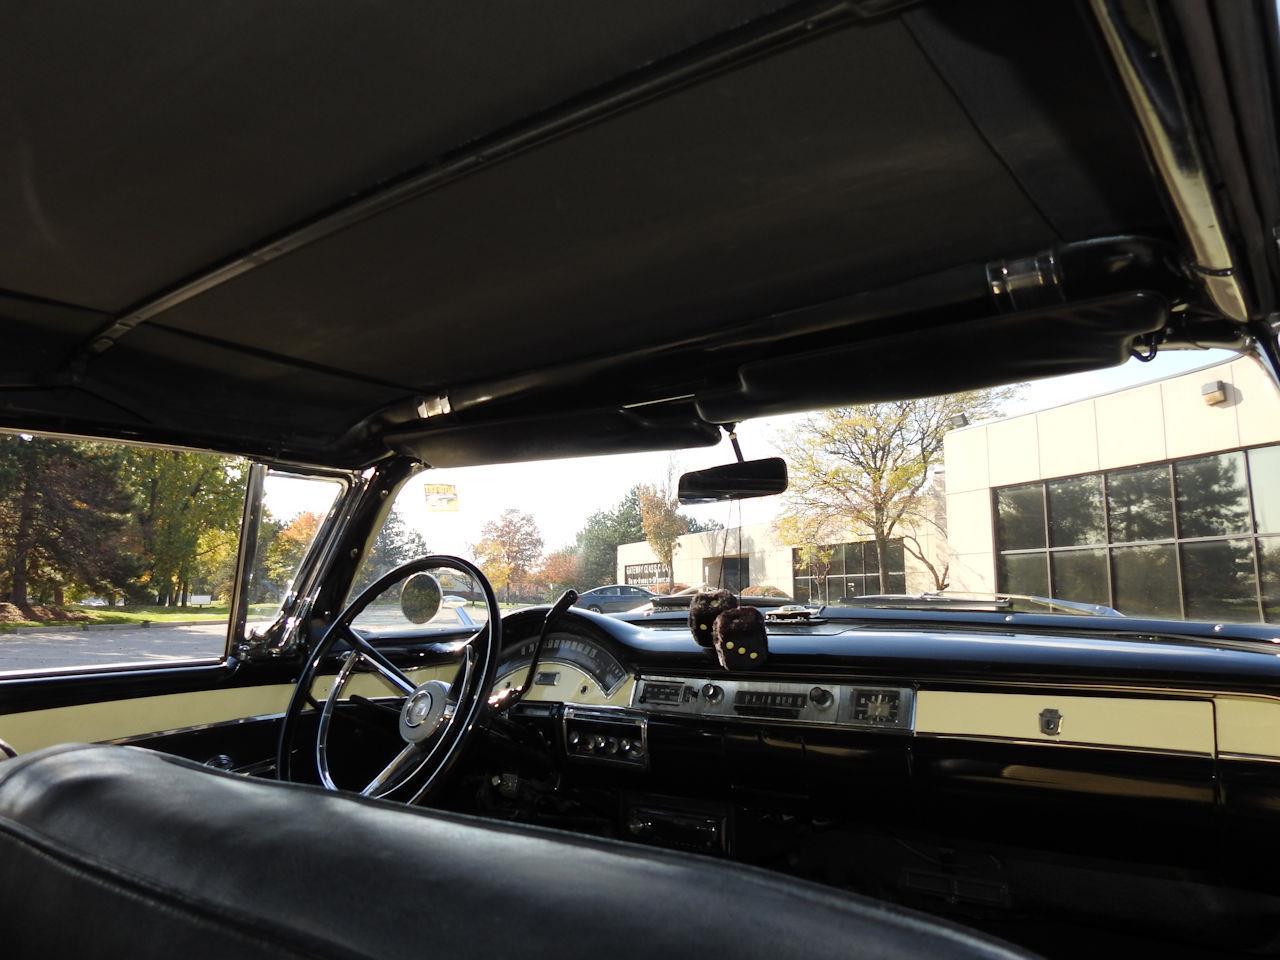 1957 Ford Fairlane 500 (CC-1423586) for sale in O'Fallon, Illinois